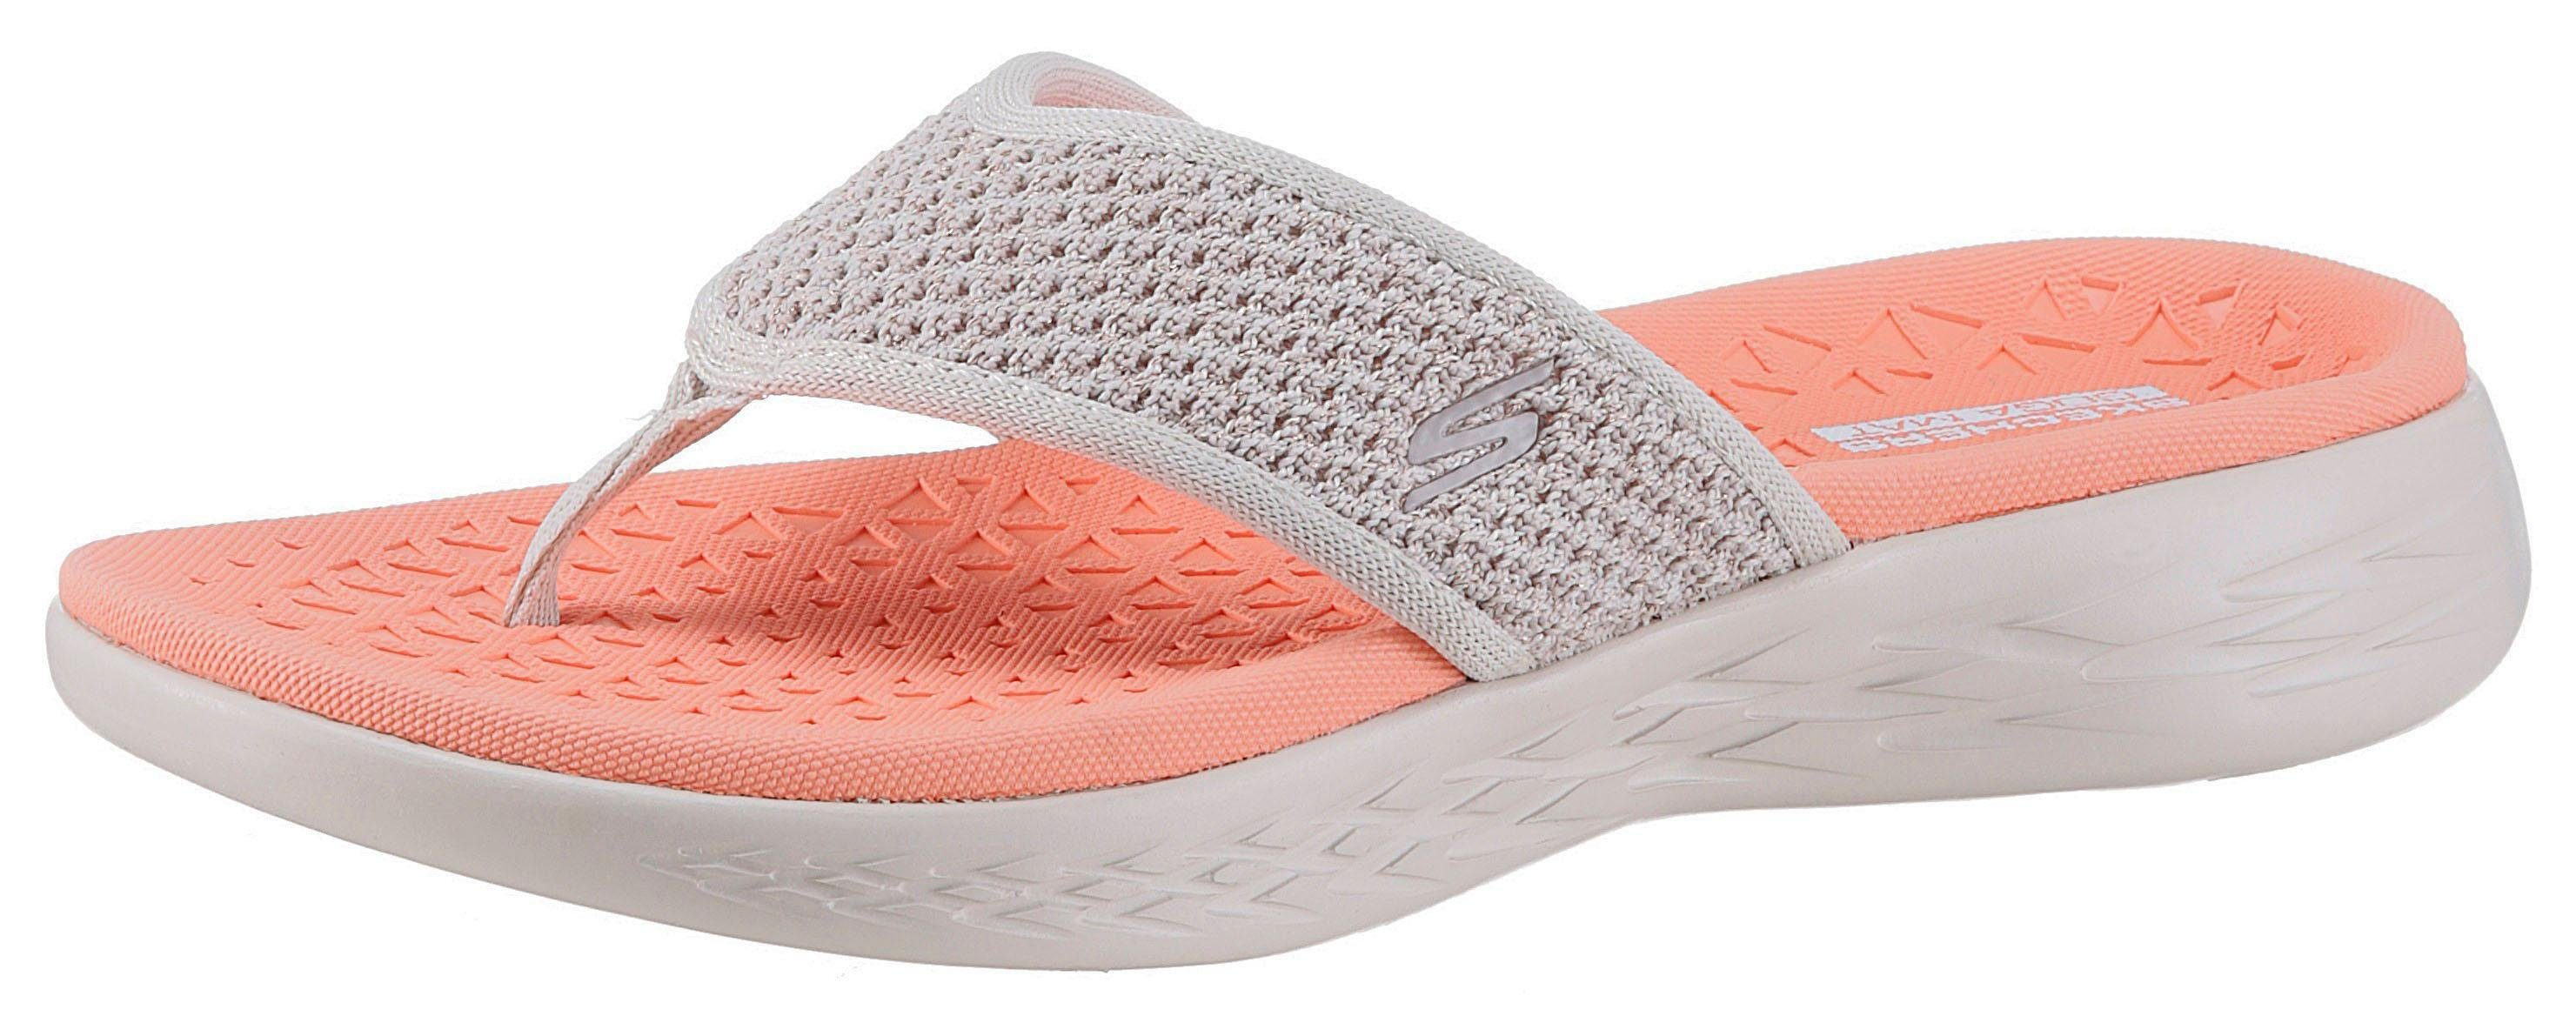 Skechers Goga Strand Damenschuhe Damen Schuhwerk Clothing, Shoes & Accessories Comfort Shoes